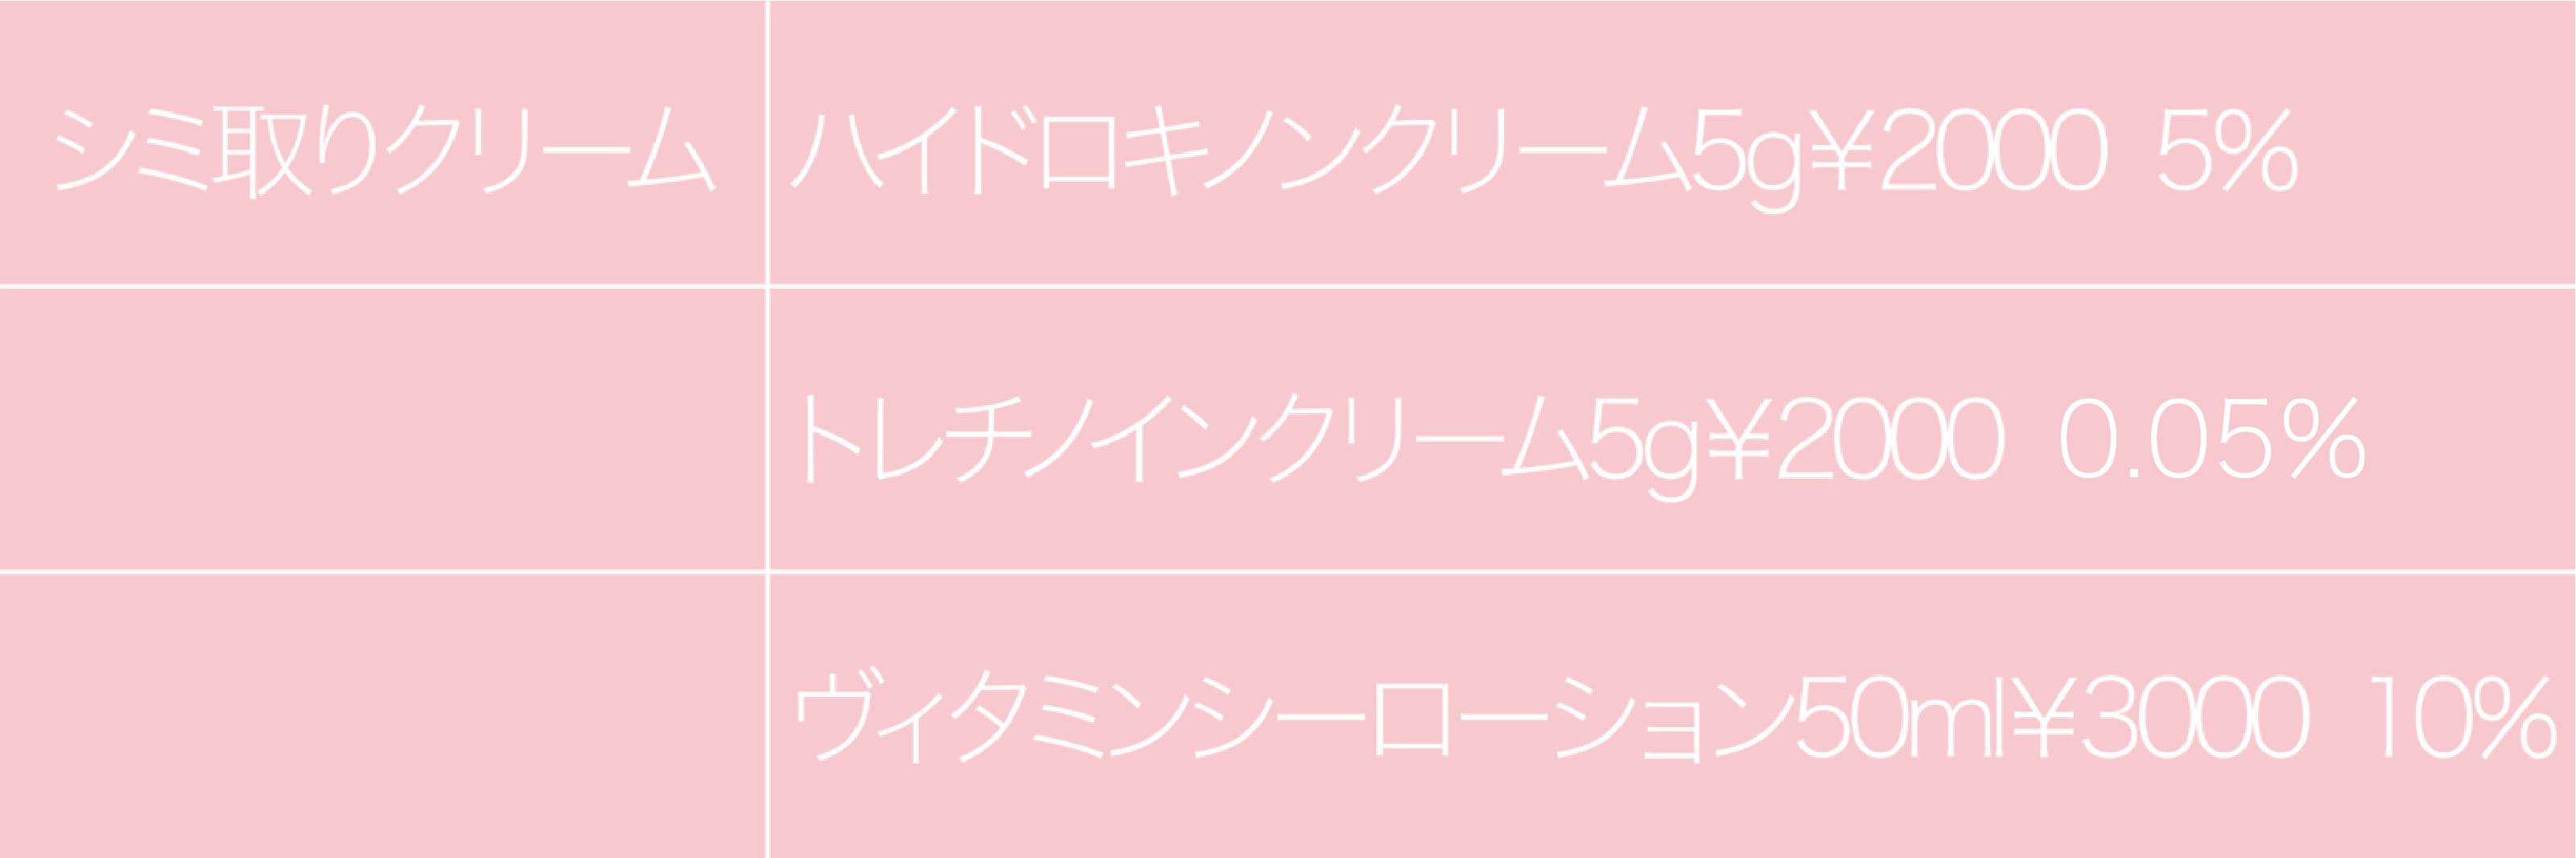 "bbzbzbbb 01 - <span style=""font-family: serif;"">婦人科・産科"